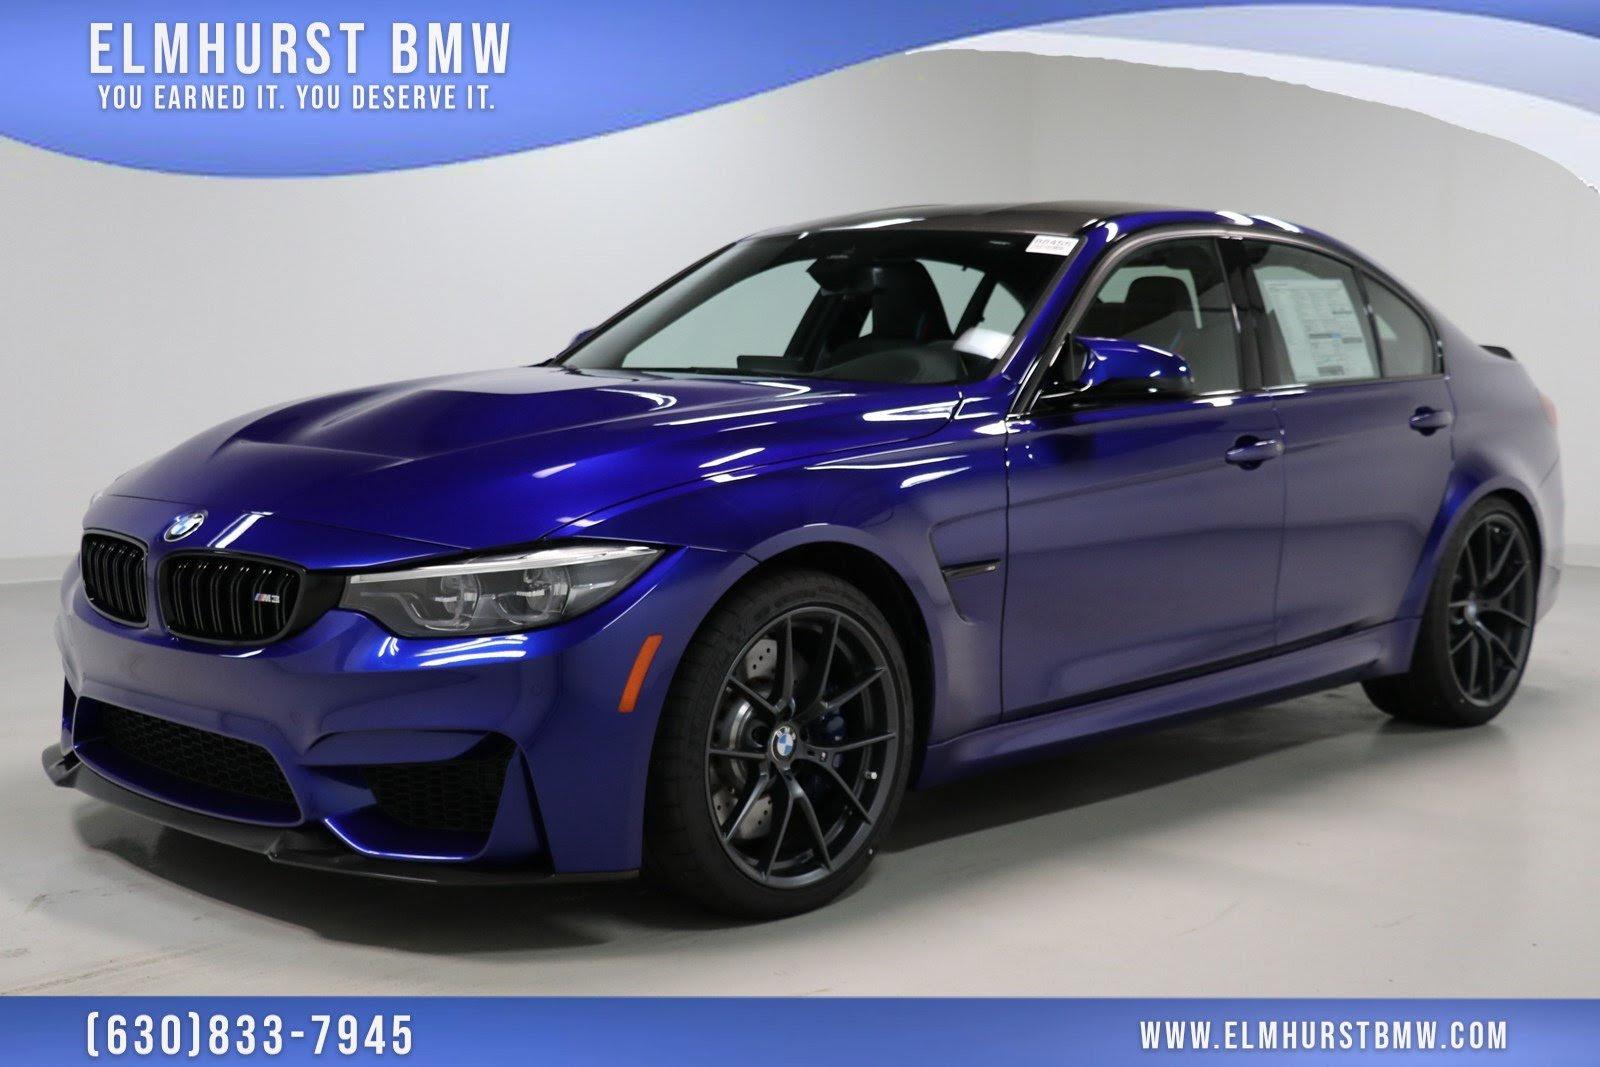 New 2018 Bmw M3 Cs 4dr Car In Elmhurst B8455 Elmhurst Auto Group